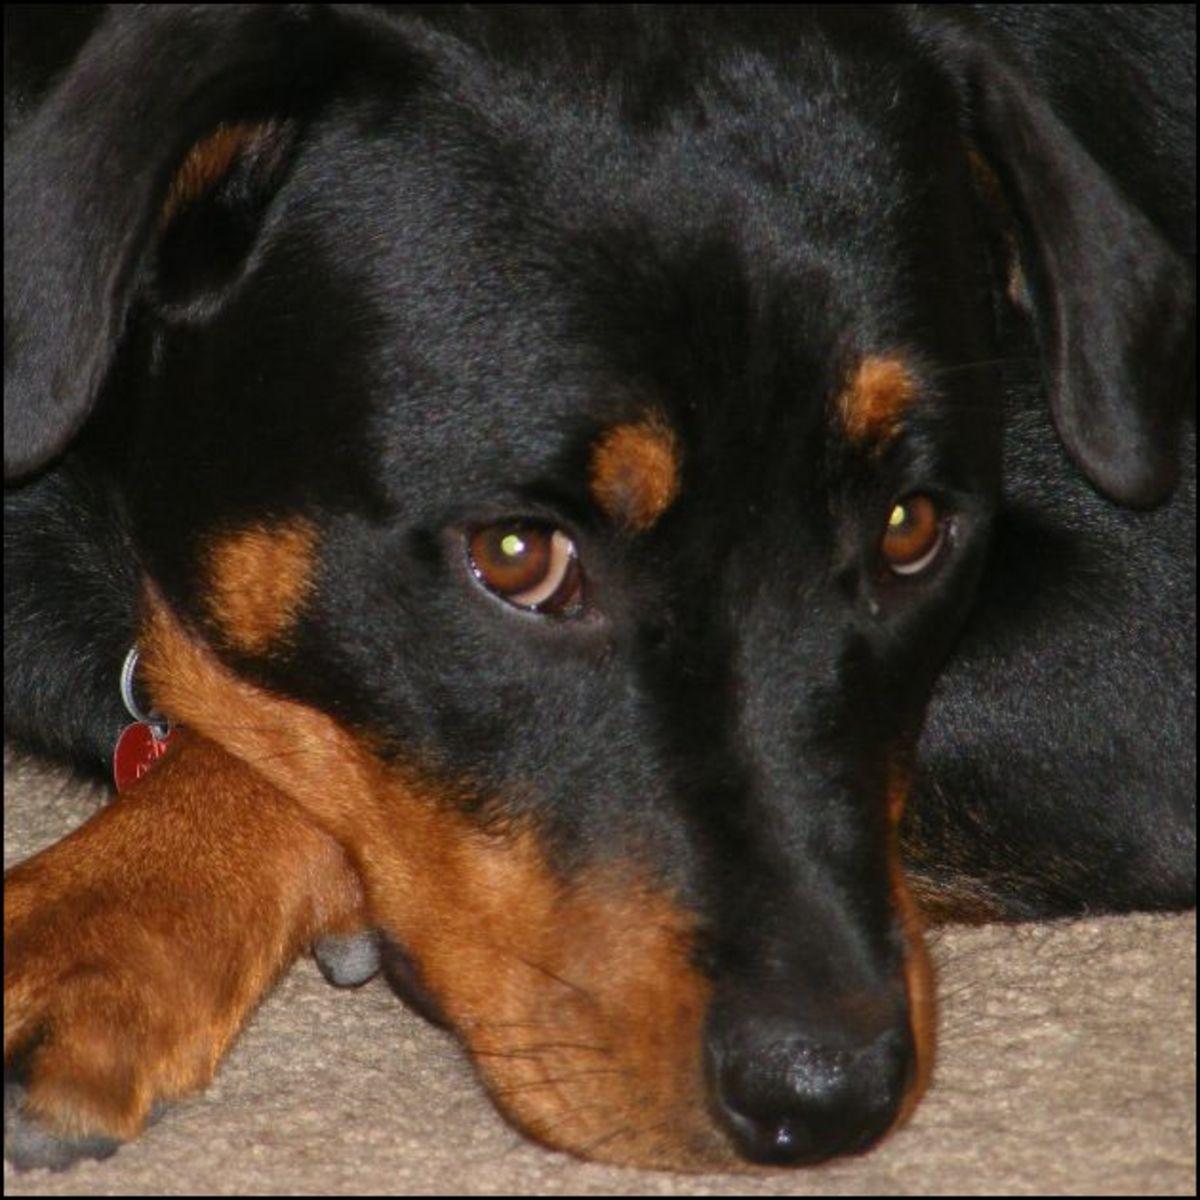 Incubation of canine papilloma virus wart